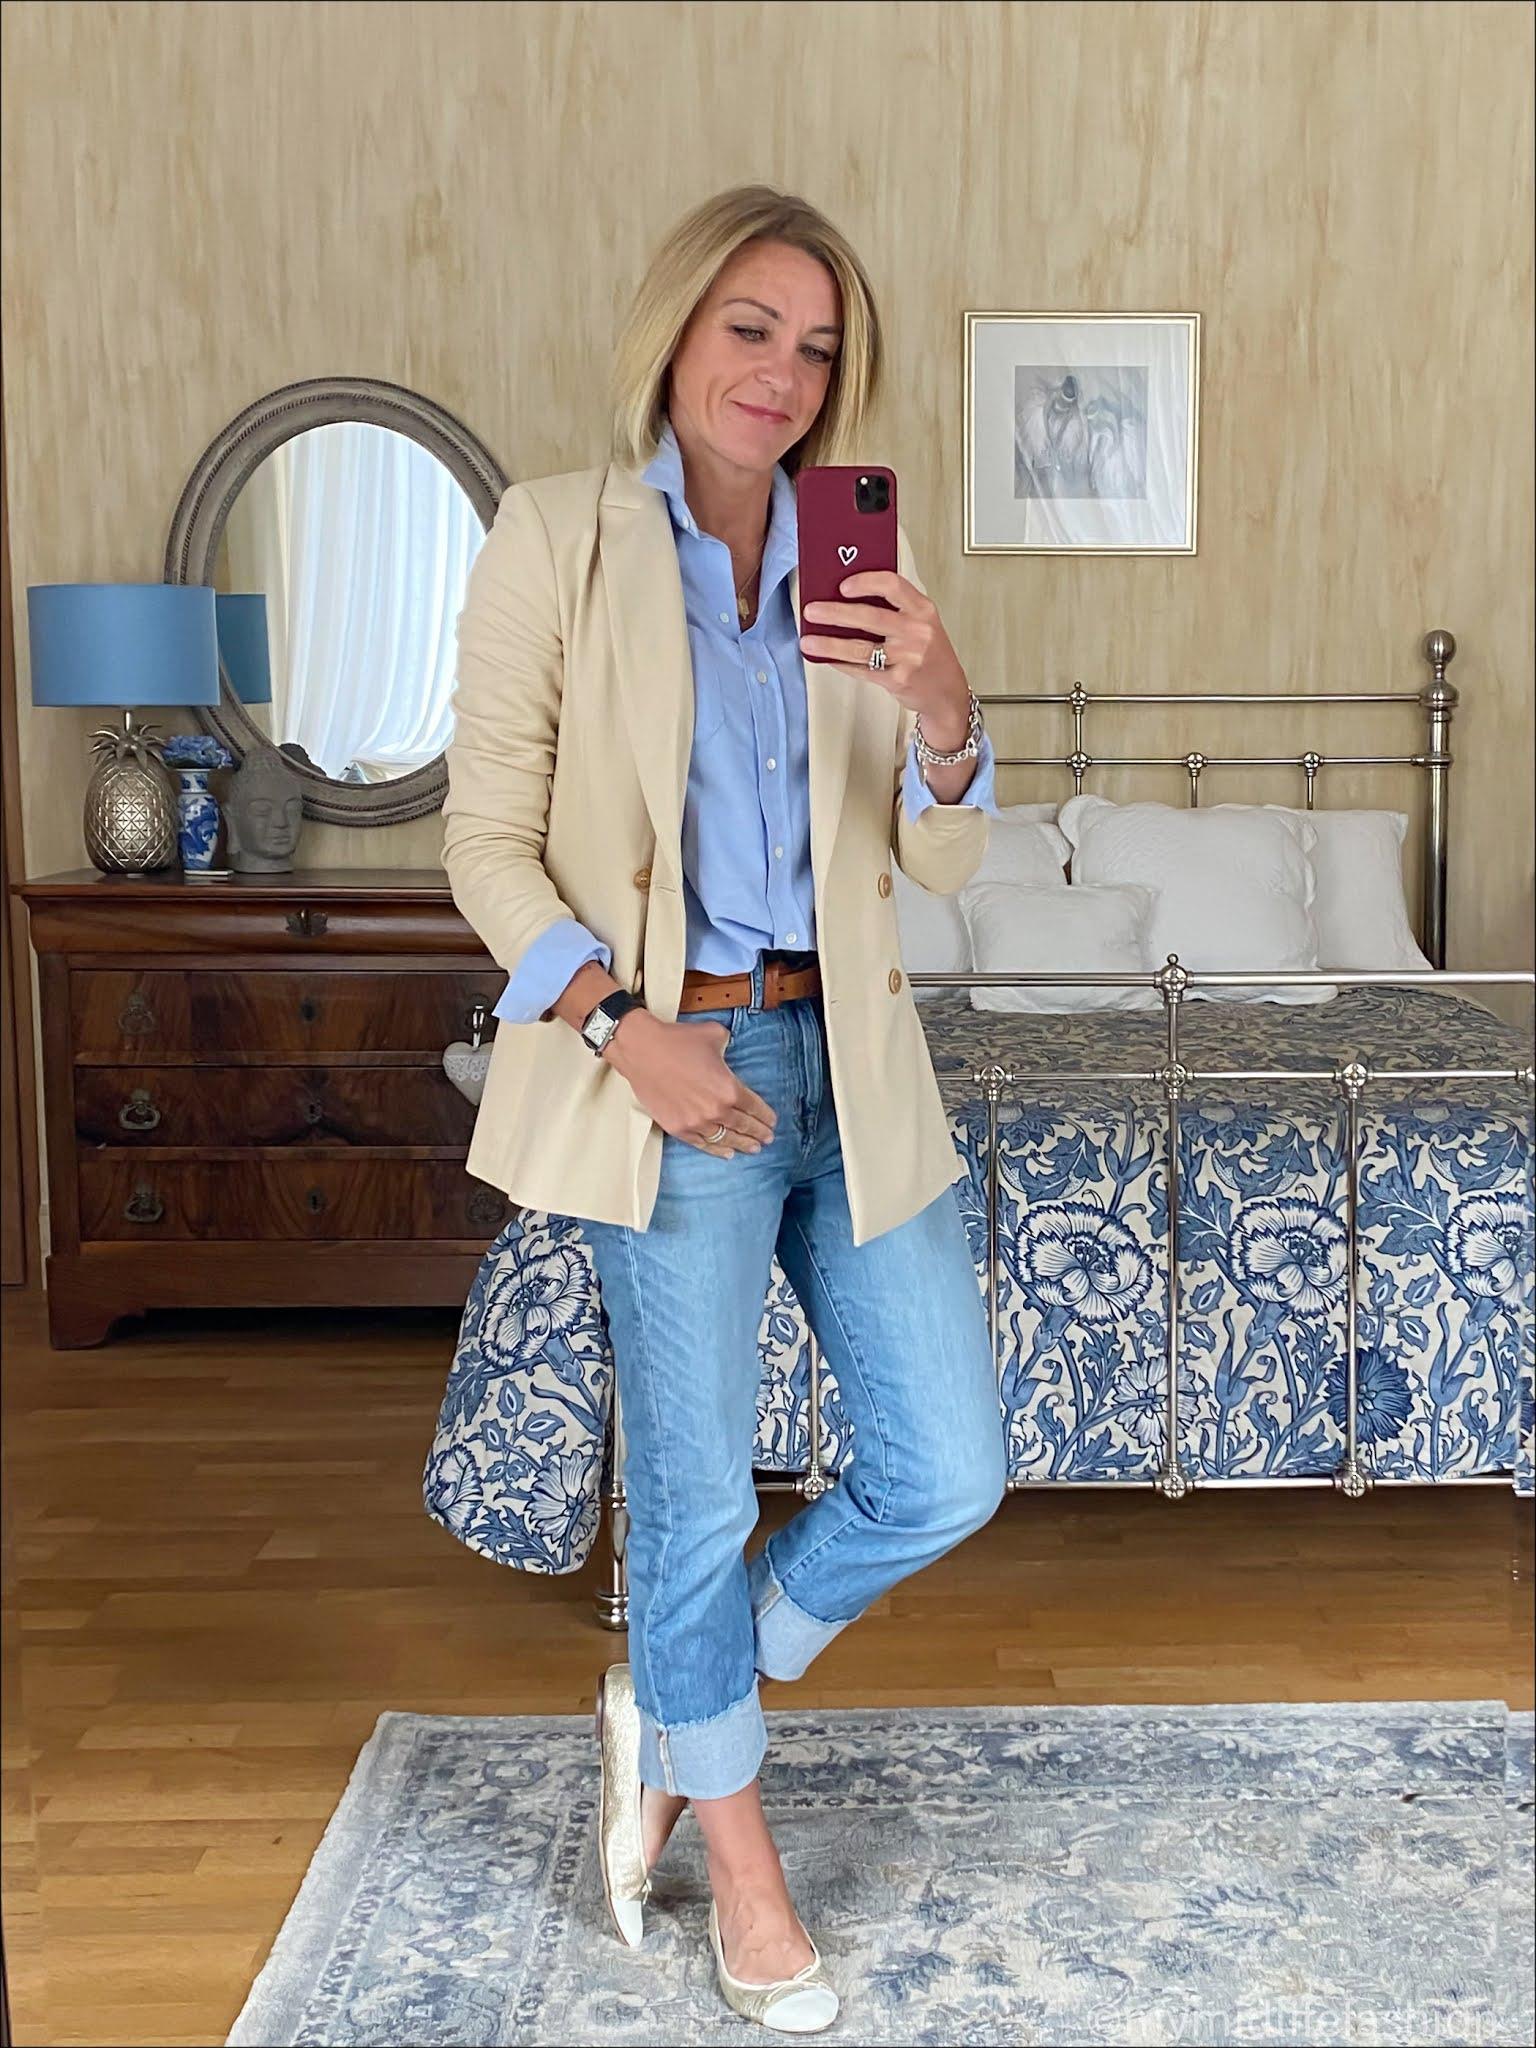 my midlife fashion, saint and Sofia Cambridge blazer, sesame tomboy shirt, Massimo Dutti leather belt, j crew turn up boyfriend jeans, j crew two tone ballet pumps